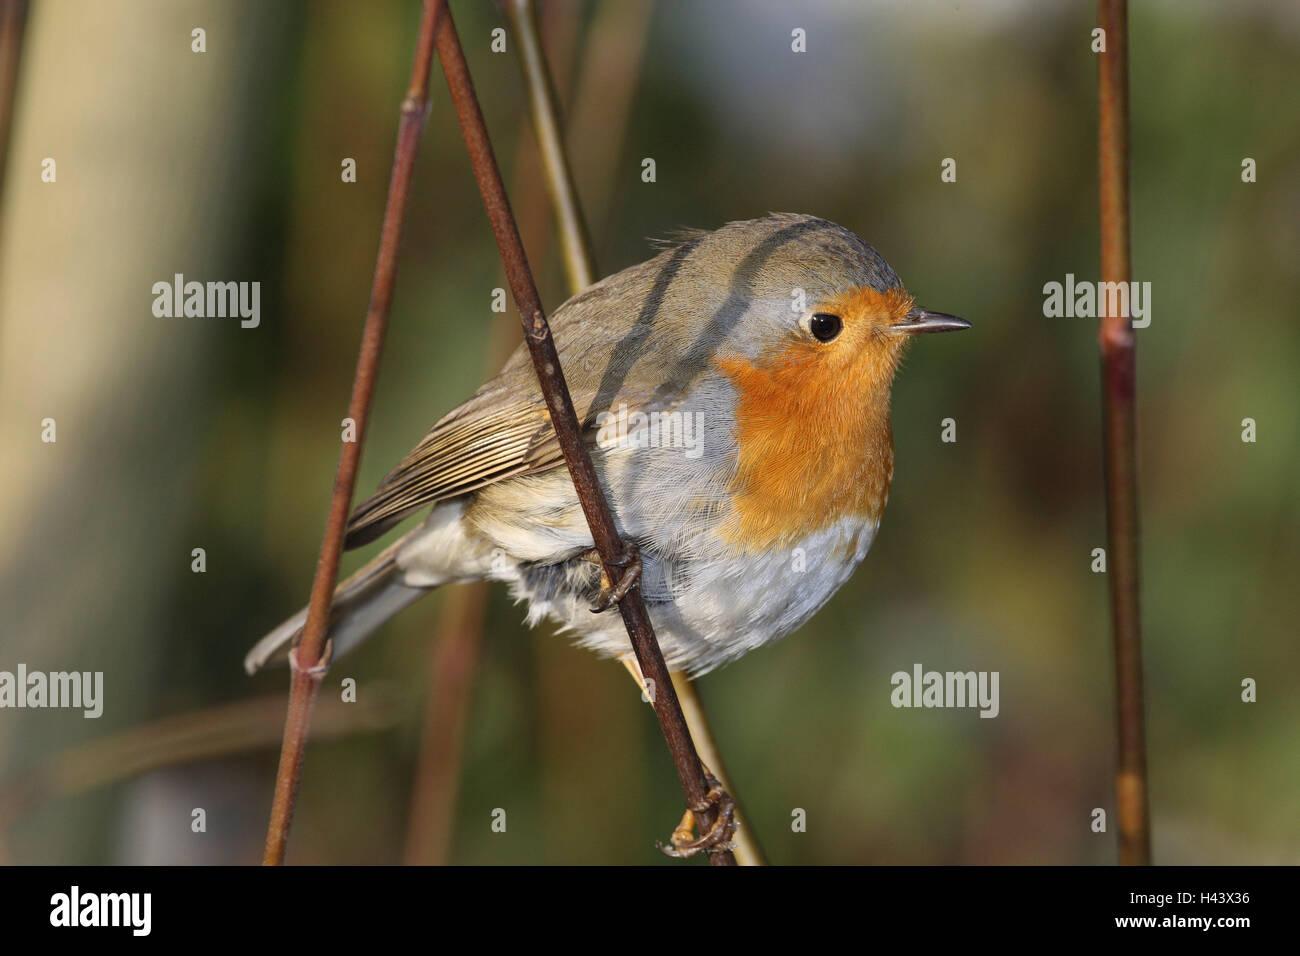 Redbreasts, branch, sit, side view, bird, songbird, Sperlingsvogel, aviation flycatcher, wild animal, animal, - Stock Image